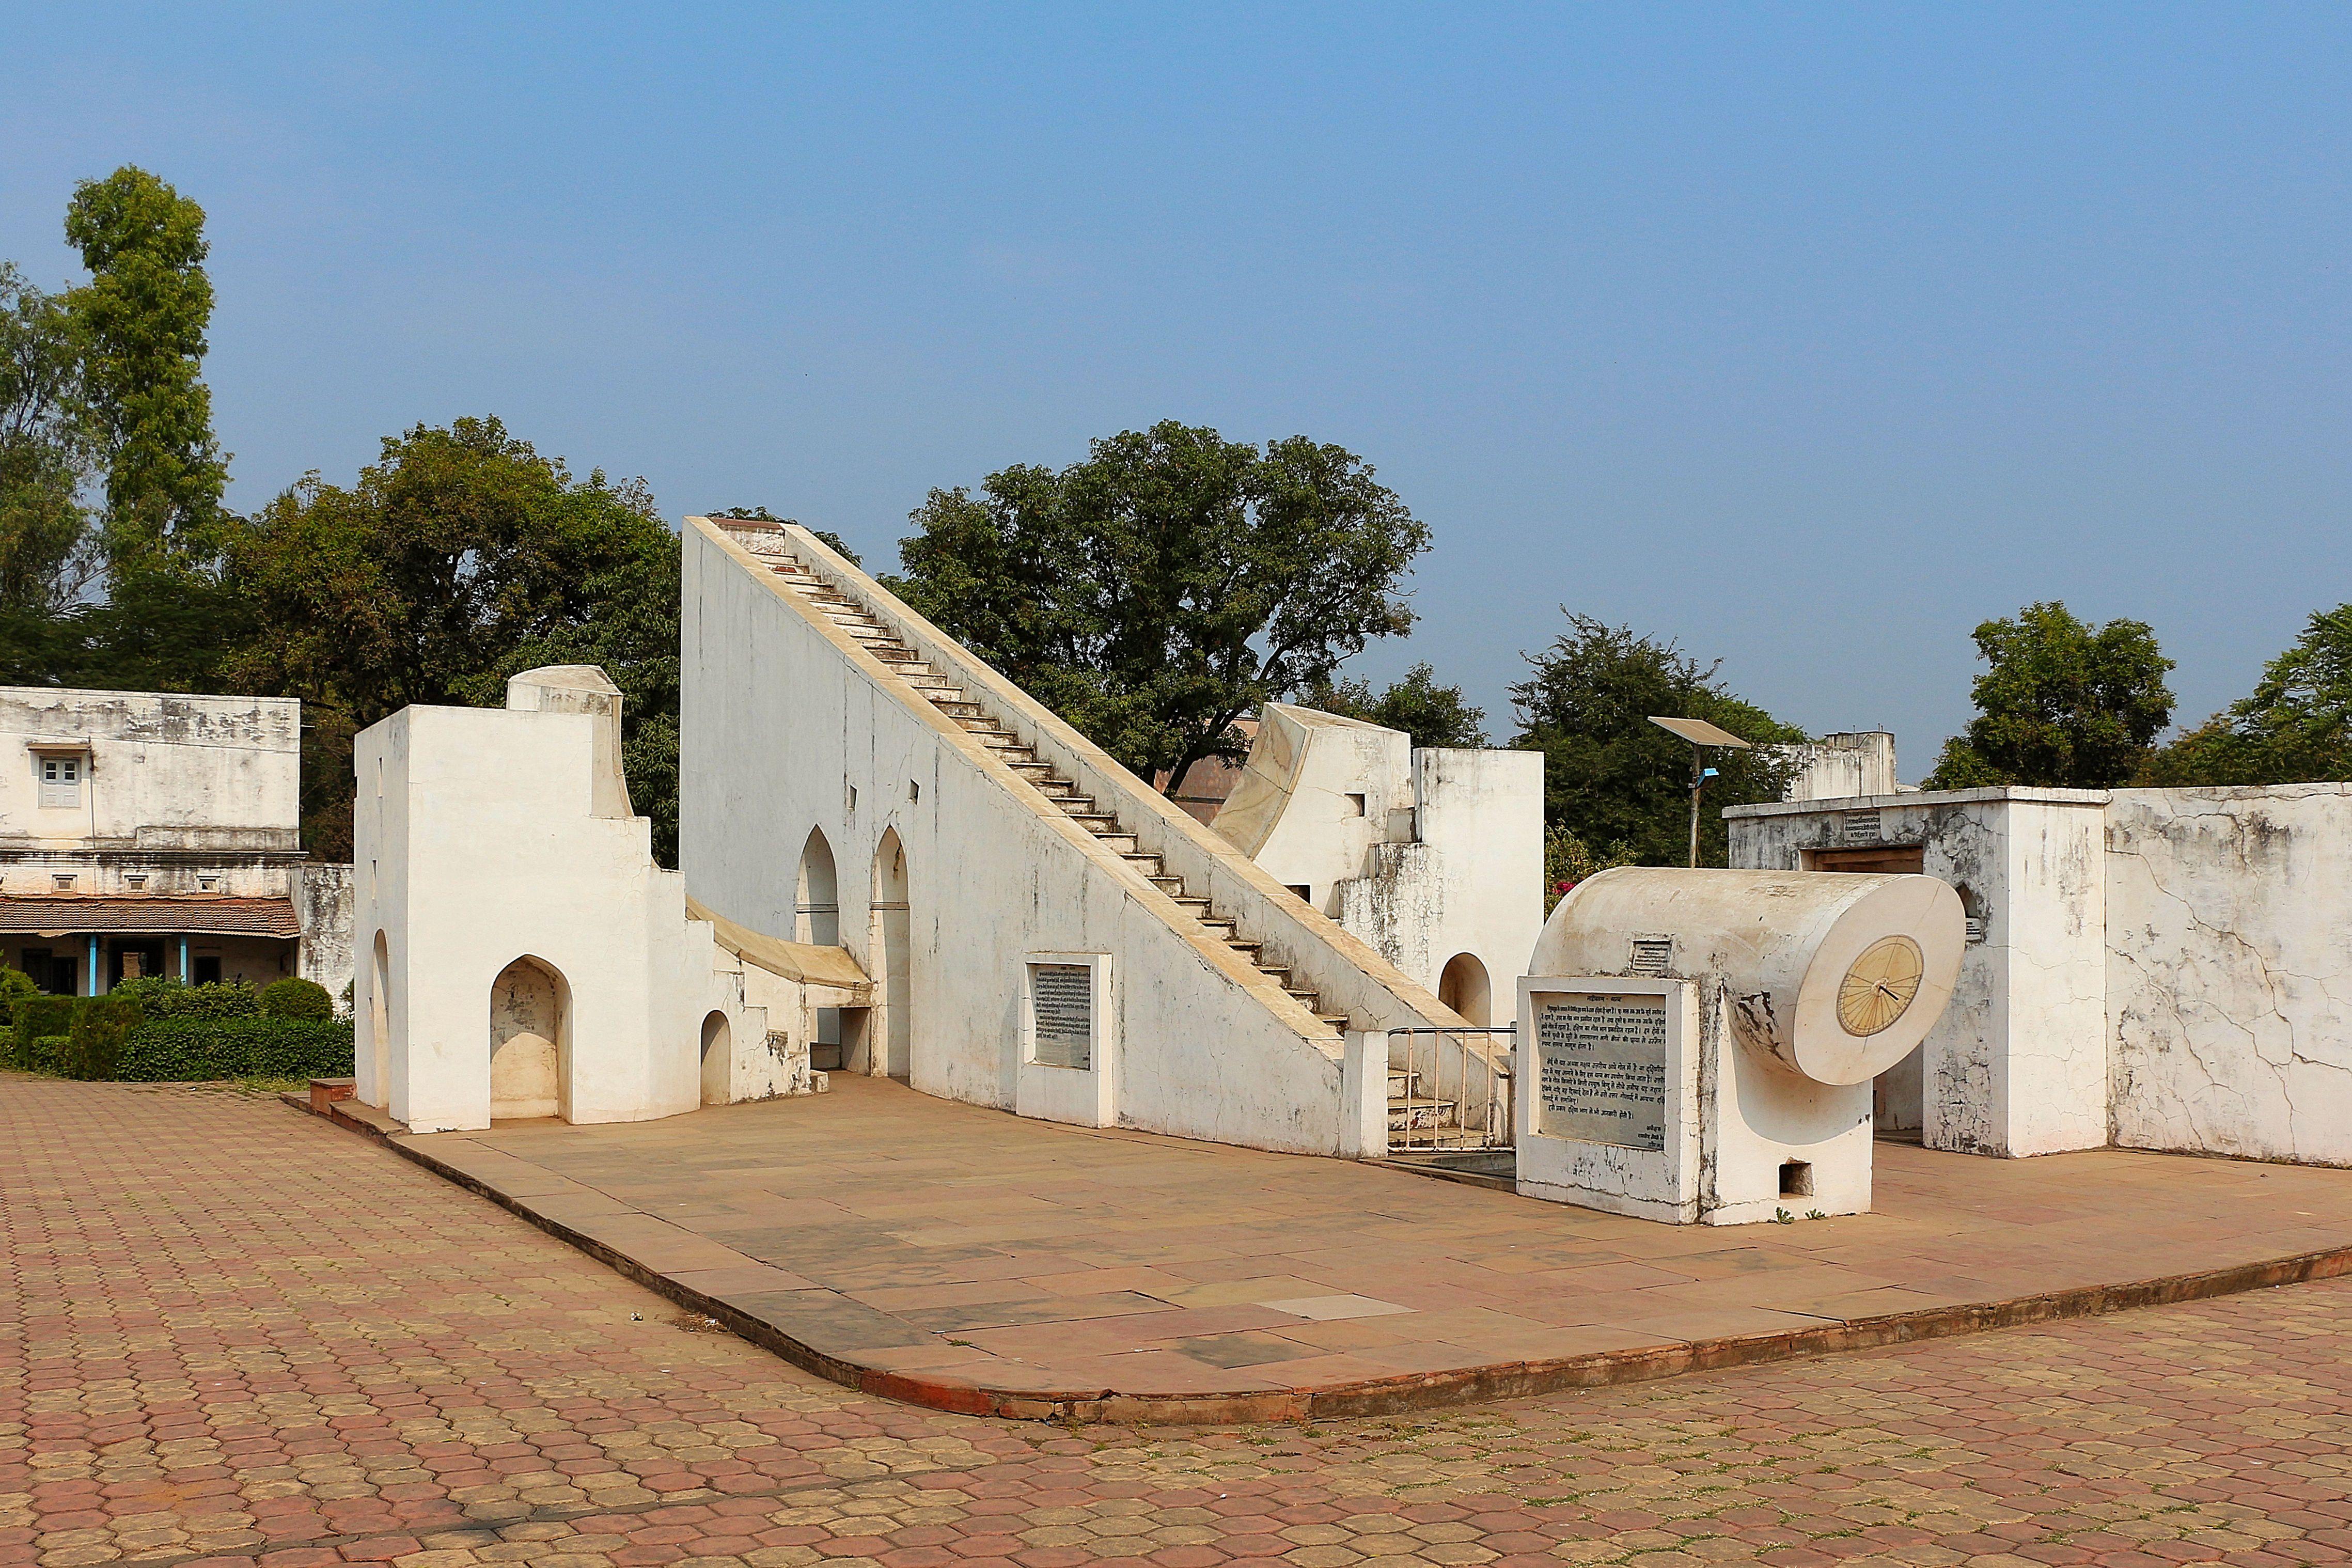 Jantar Mantar, Ujjain.